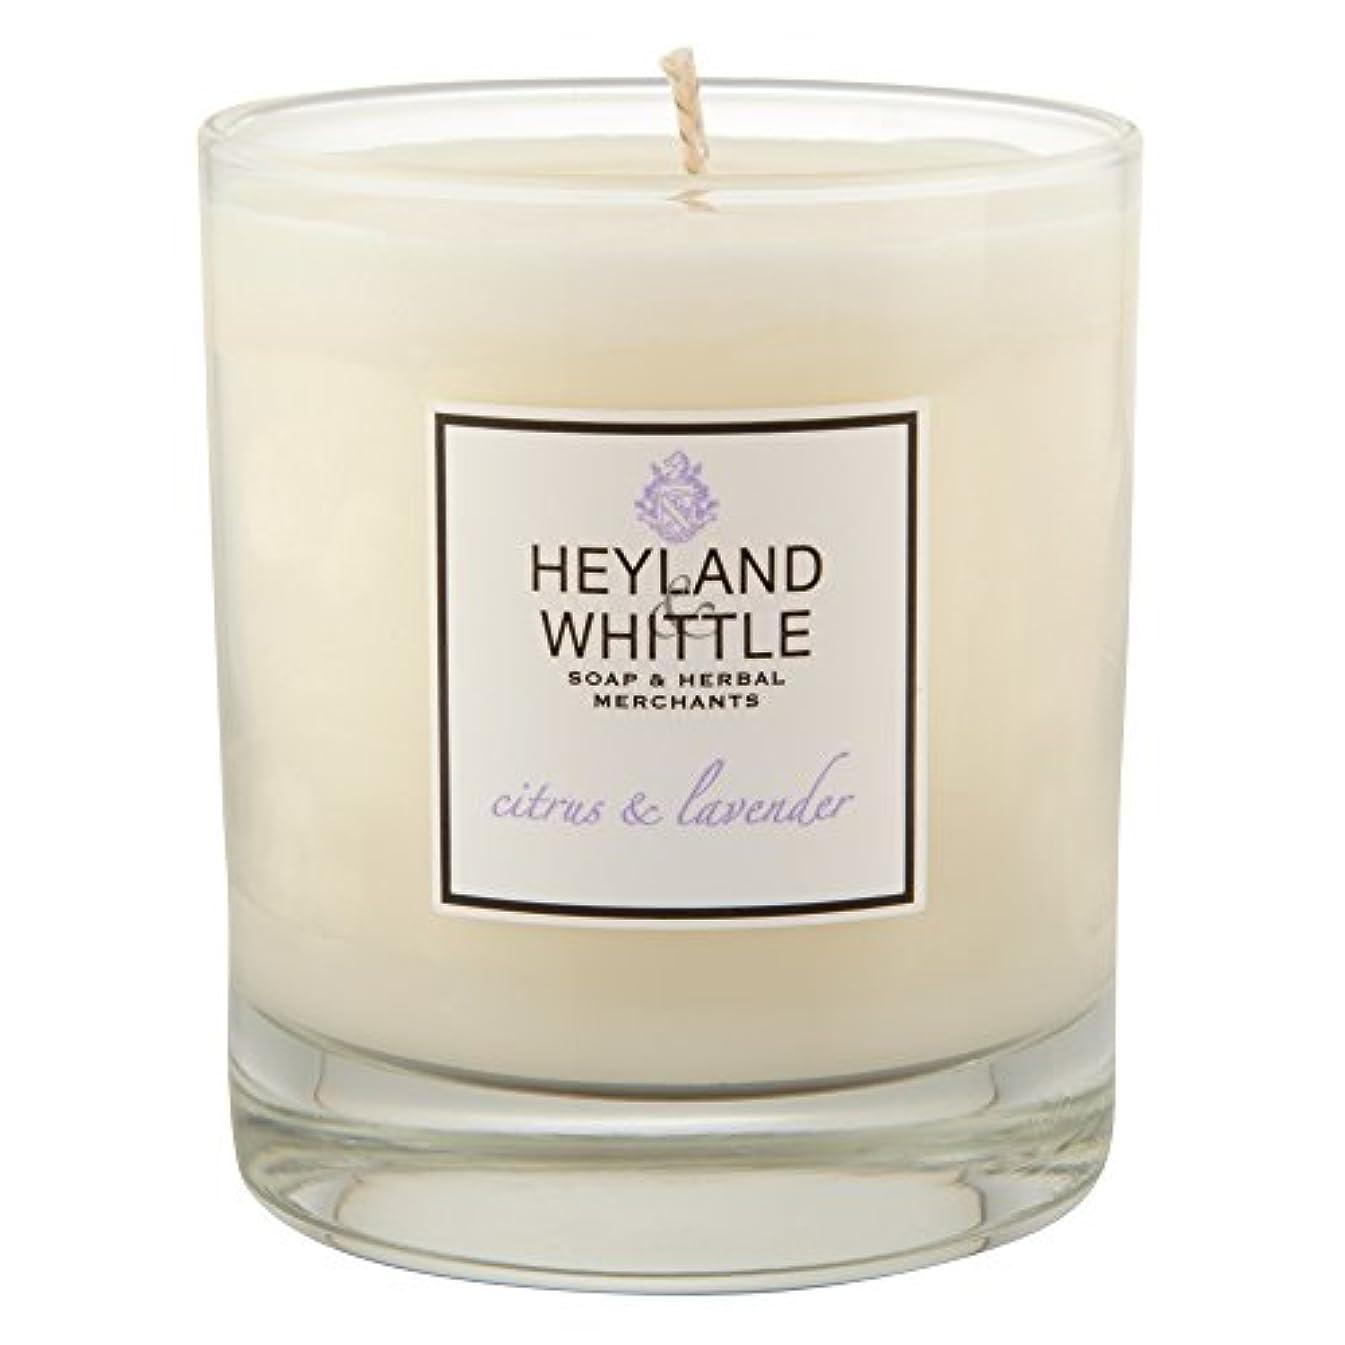 Heyland&削るシトラスとラベンダーキャンドル (Heyland & Whittle) - Heyland & Whittle Citrus and Lavender Candle [並行輸入品]